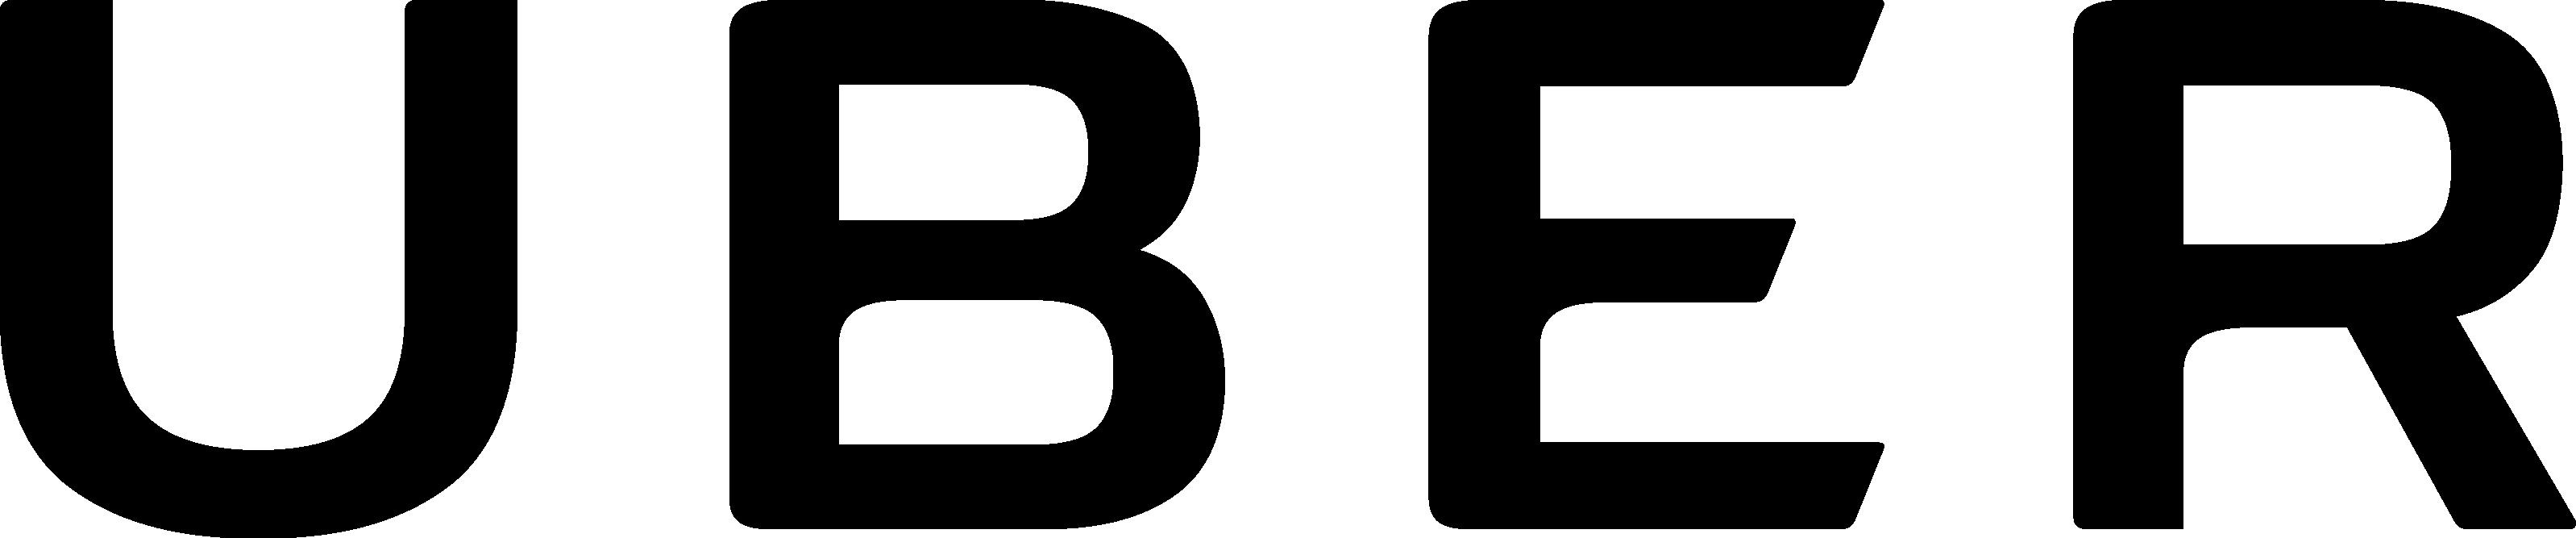 Uber Vector PNG - 108177